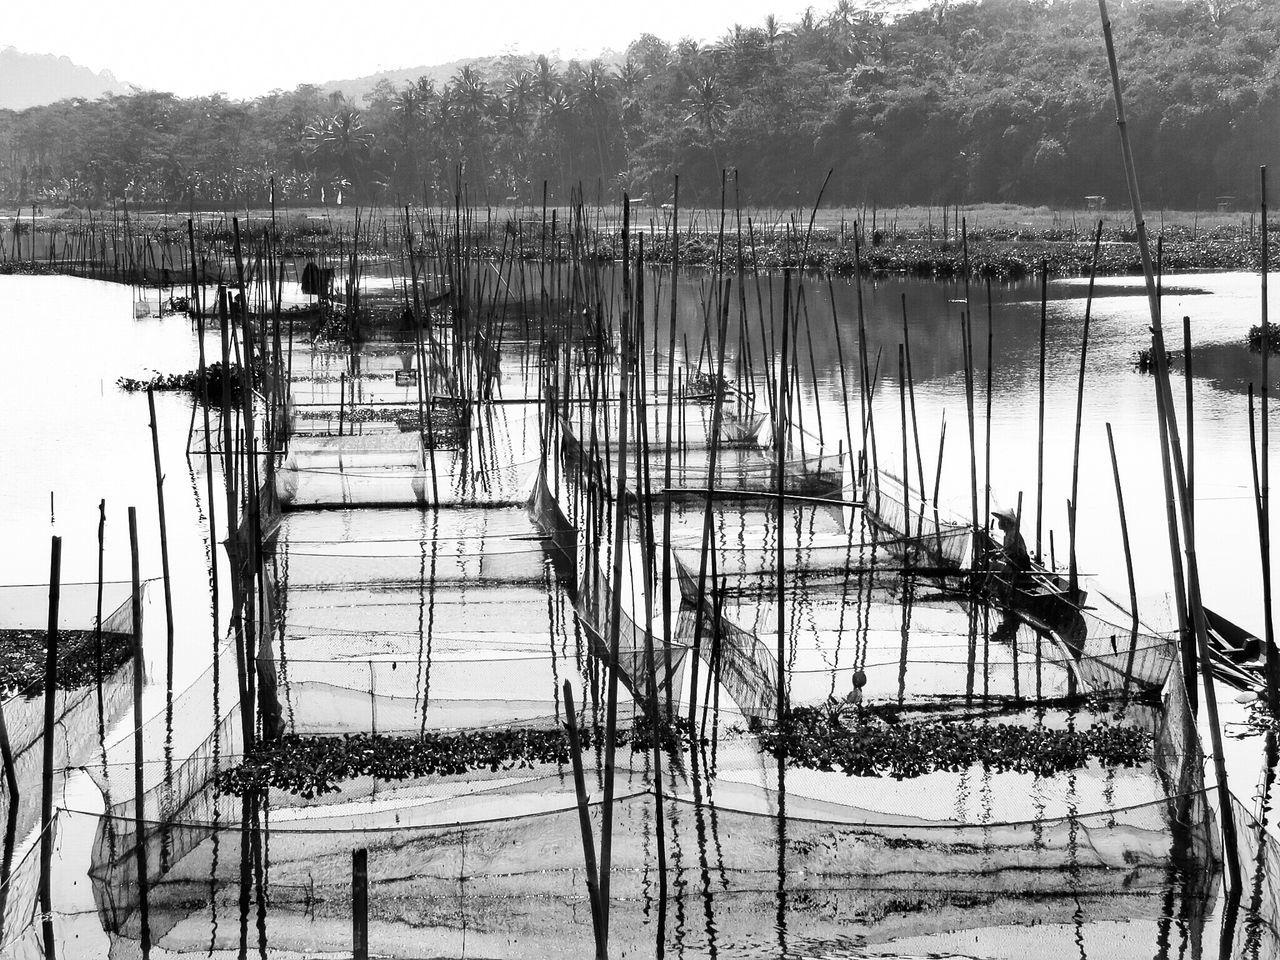 Rawapening #indonesia #centraljava Fishingnets